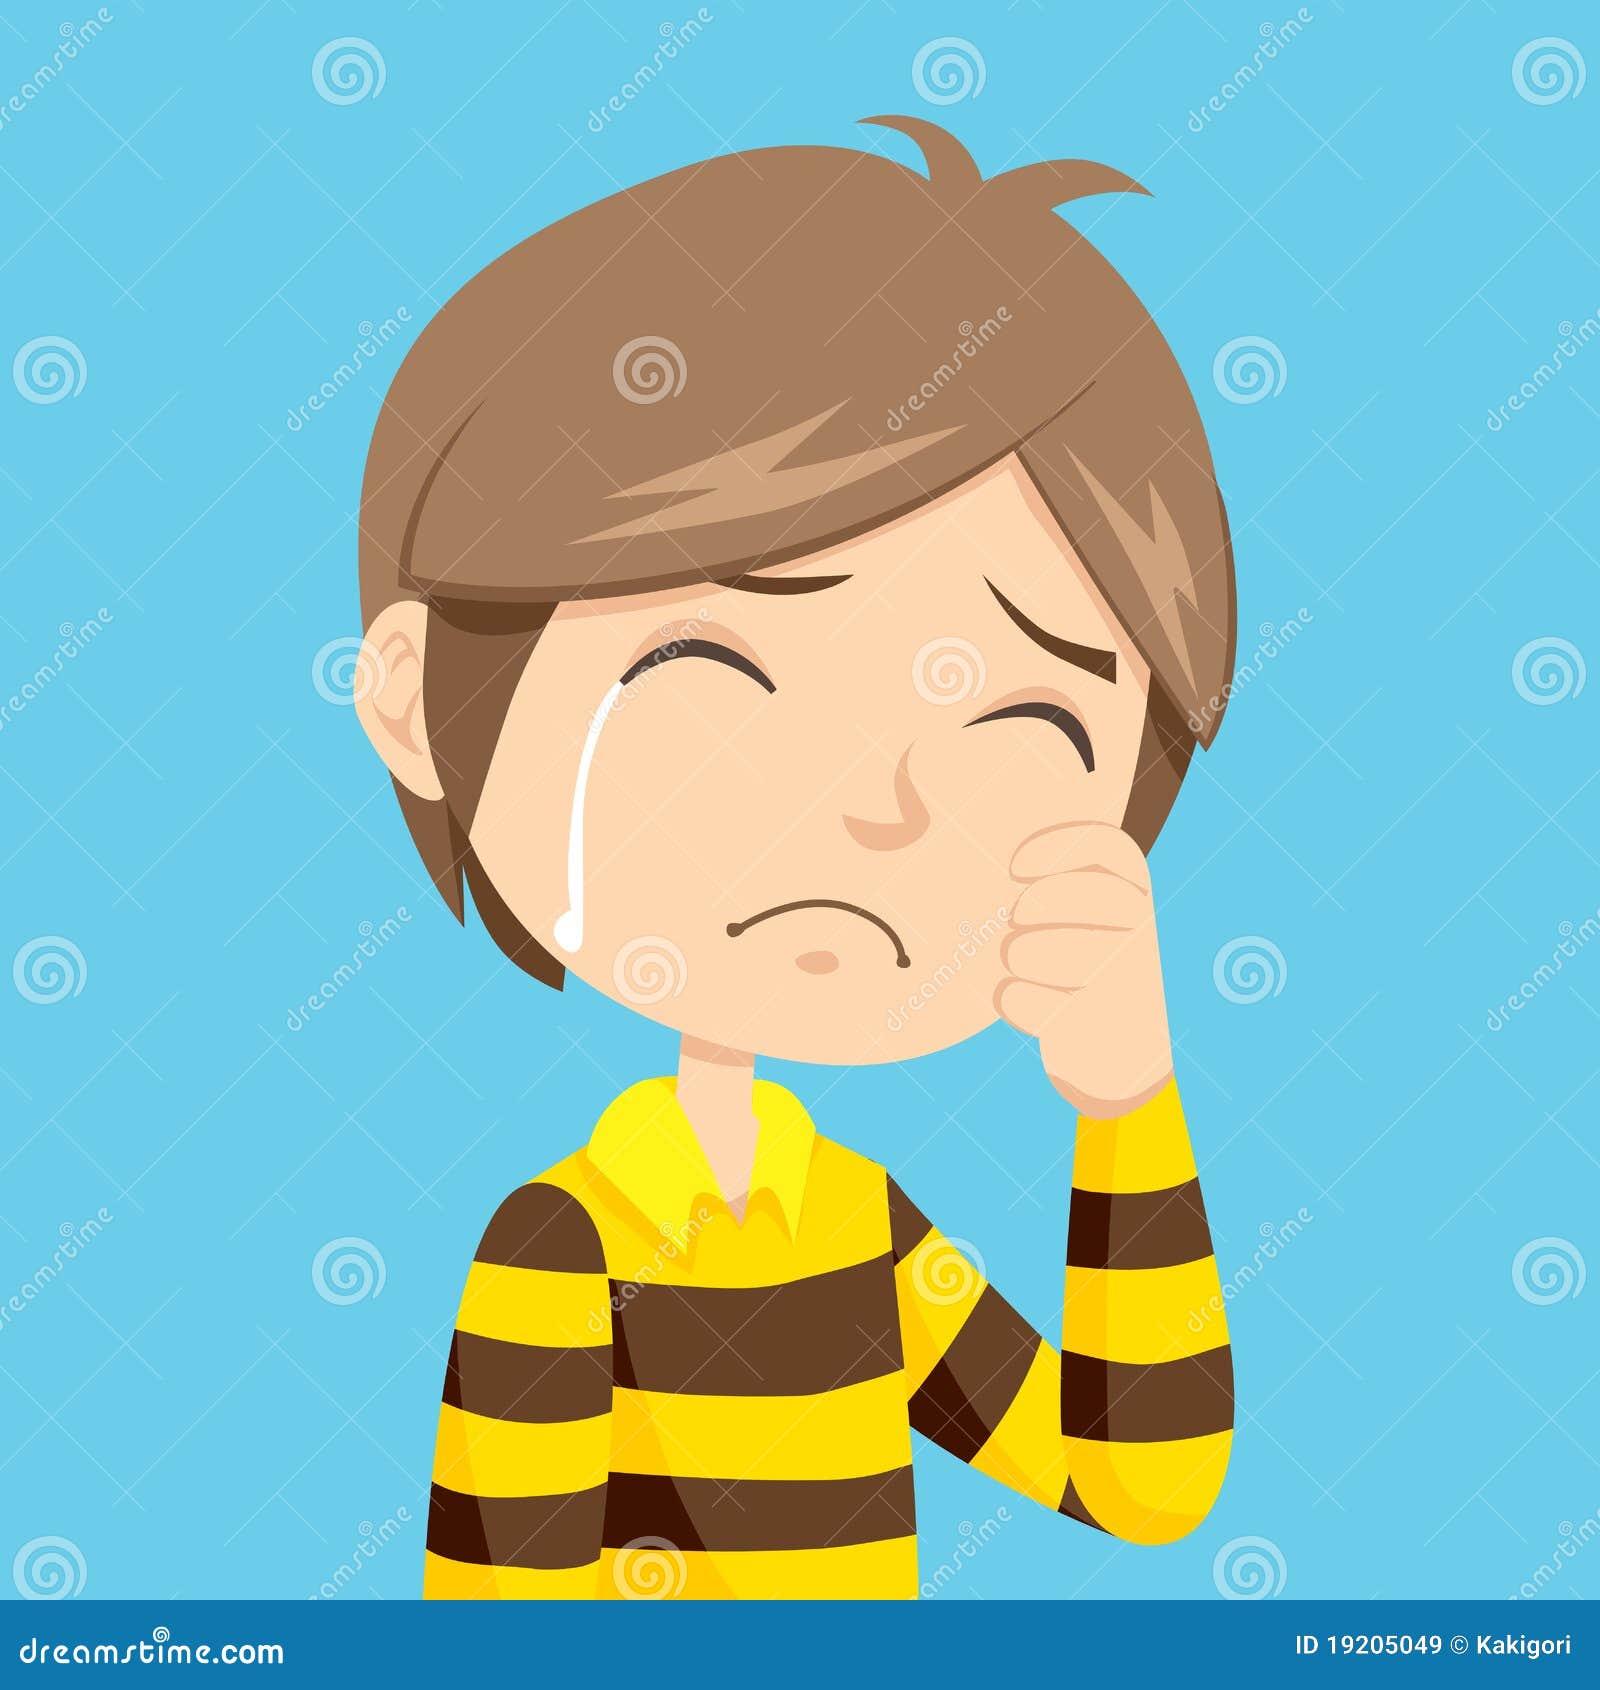 Sad Cartoon Boy Stock Photos Royalty Free